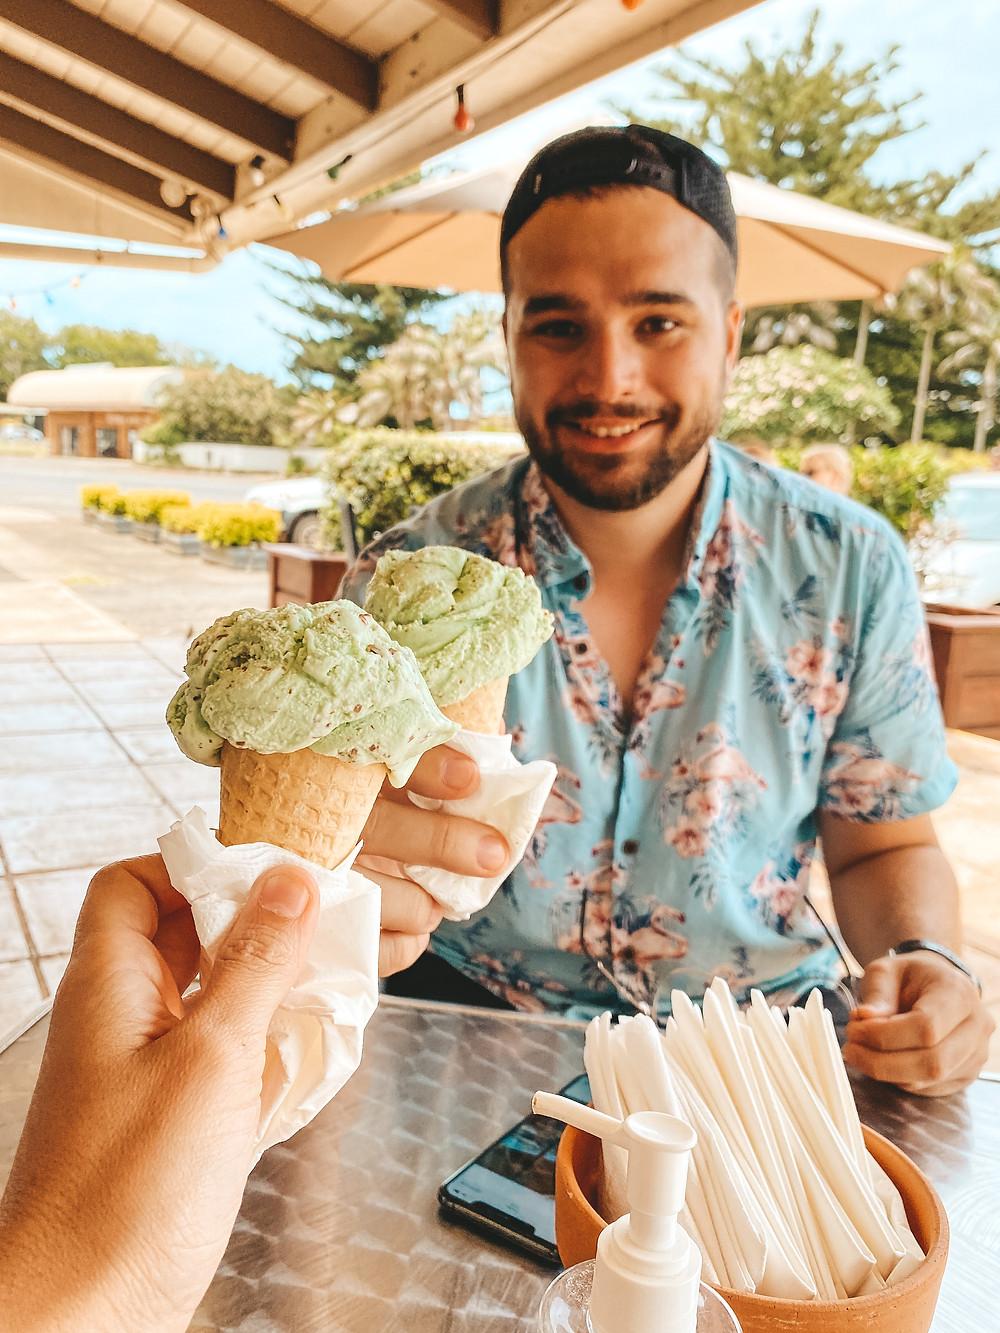 Homemade Ice-cream from Seriously Chocolate Norfolk Island